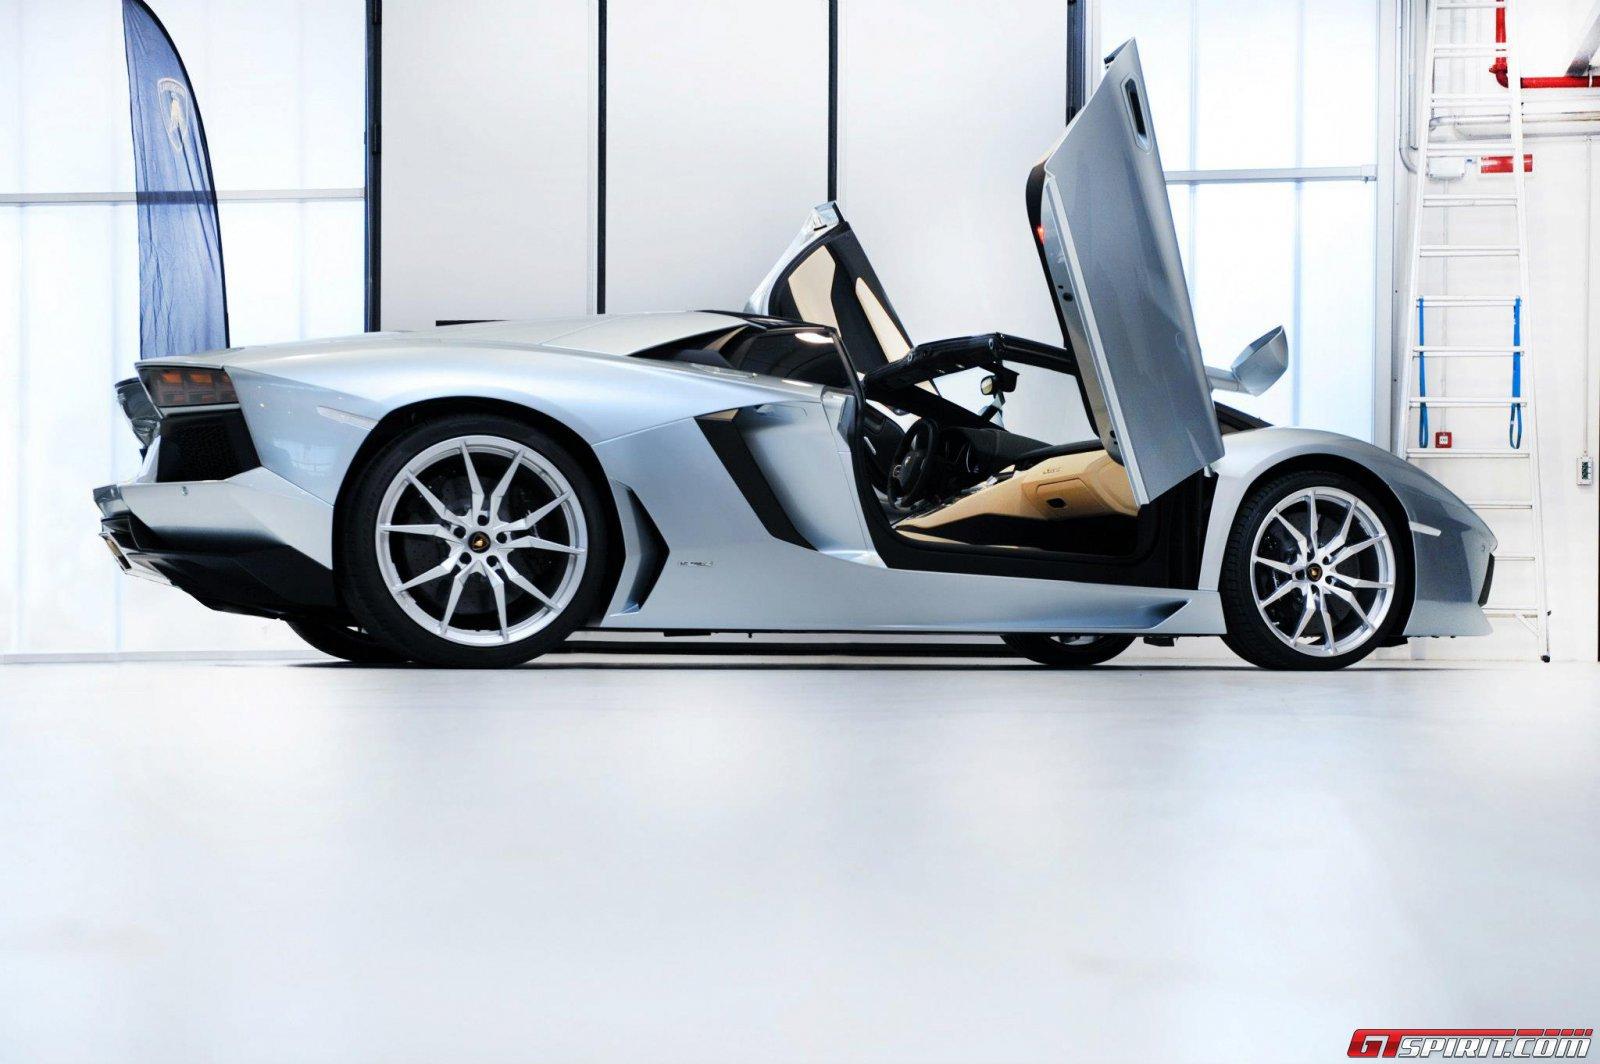 2013 Lamborghini Aventador LP700-4 Roadster Photo 26